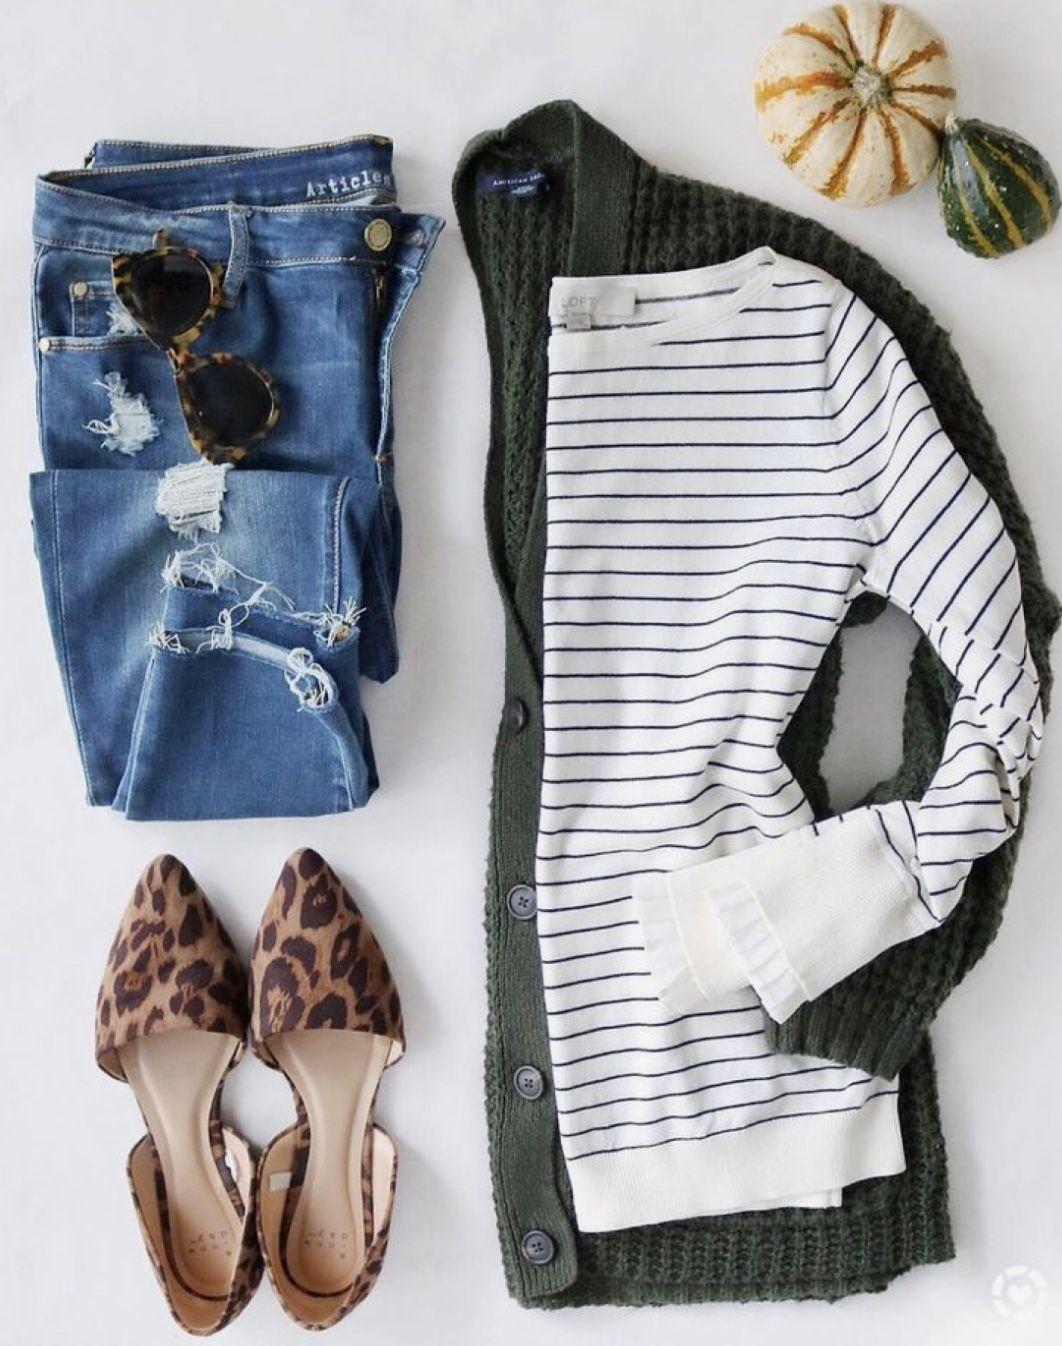 d83b11c8c05 outfit